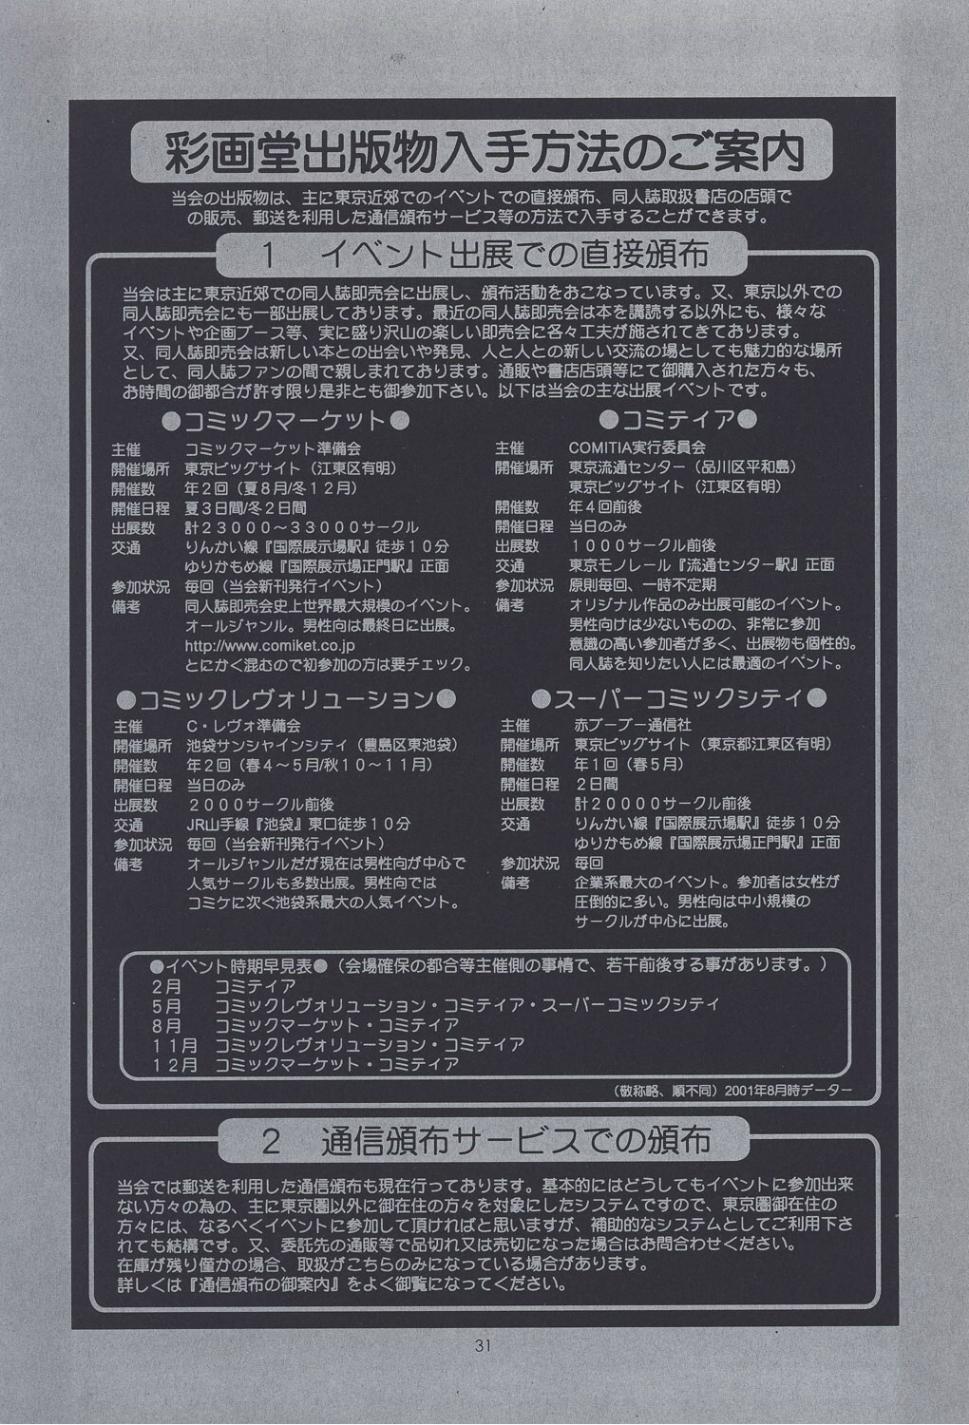 The Yuri & Friends Fullcolor 4 SAKURA vs. YURI EDITION 29